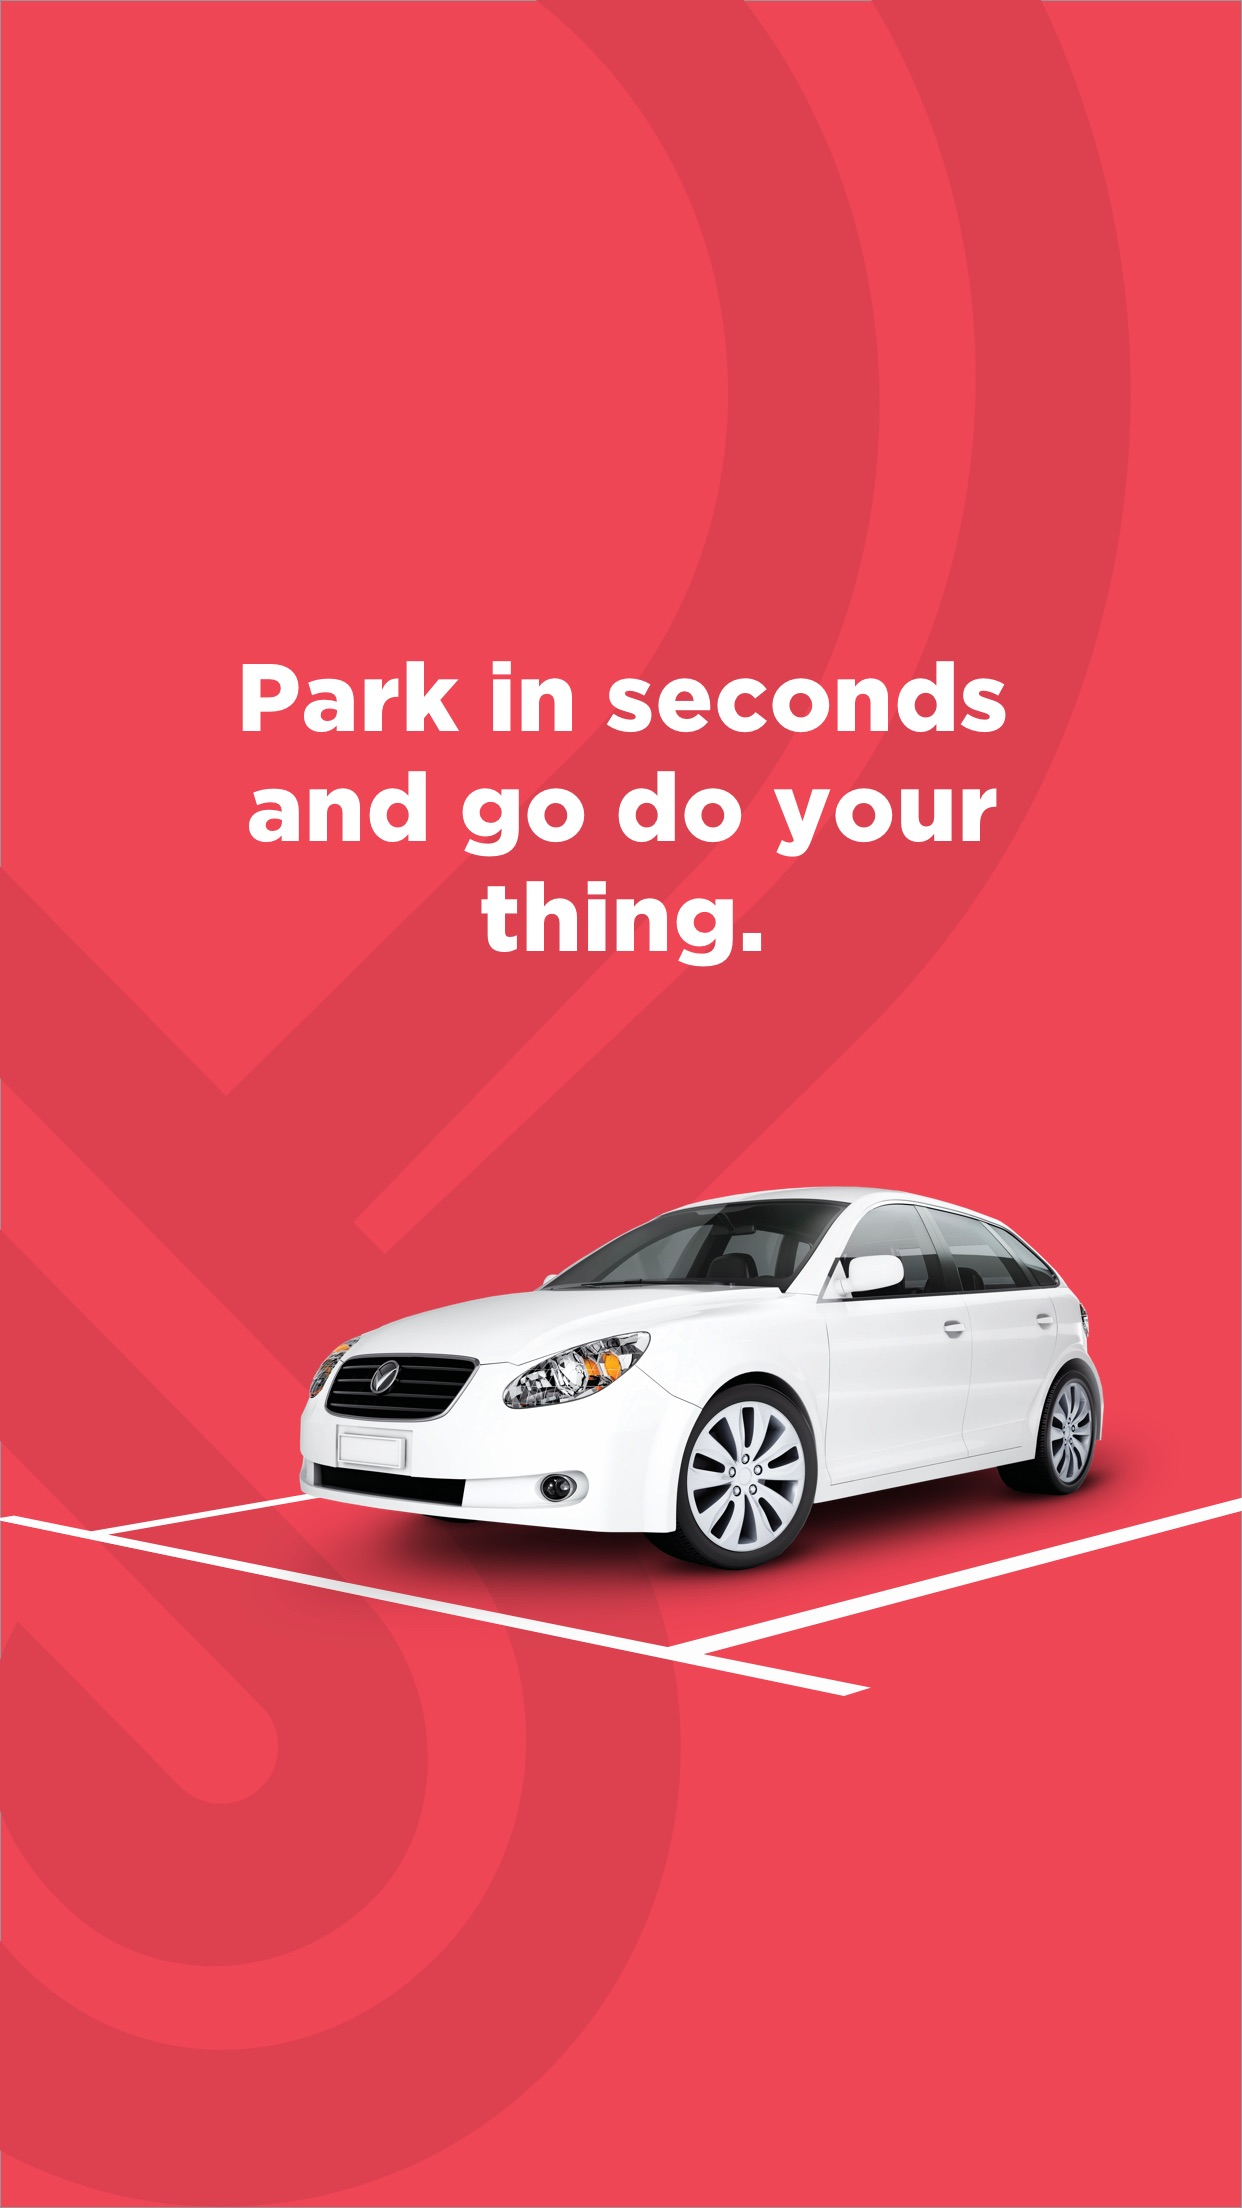 ParkWhiz - #1 Parking App Screenshot